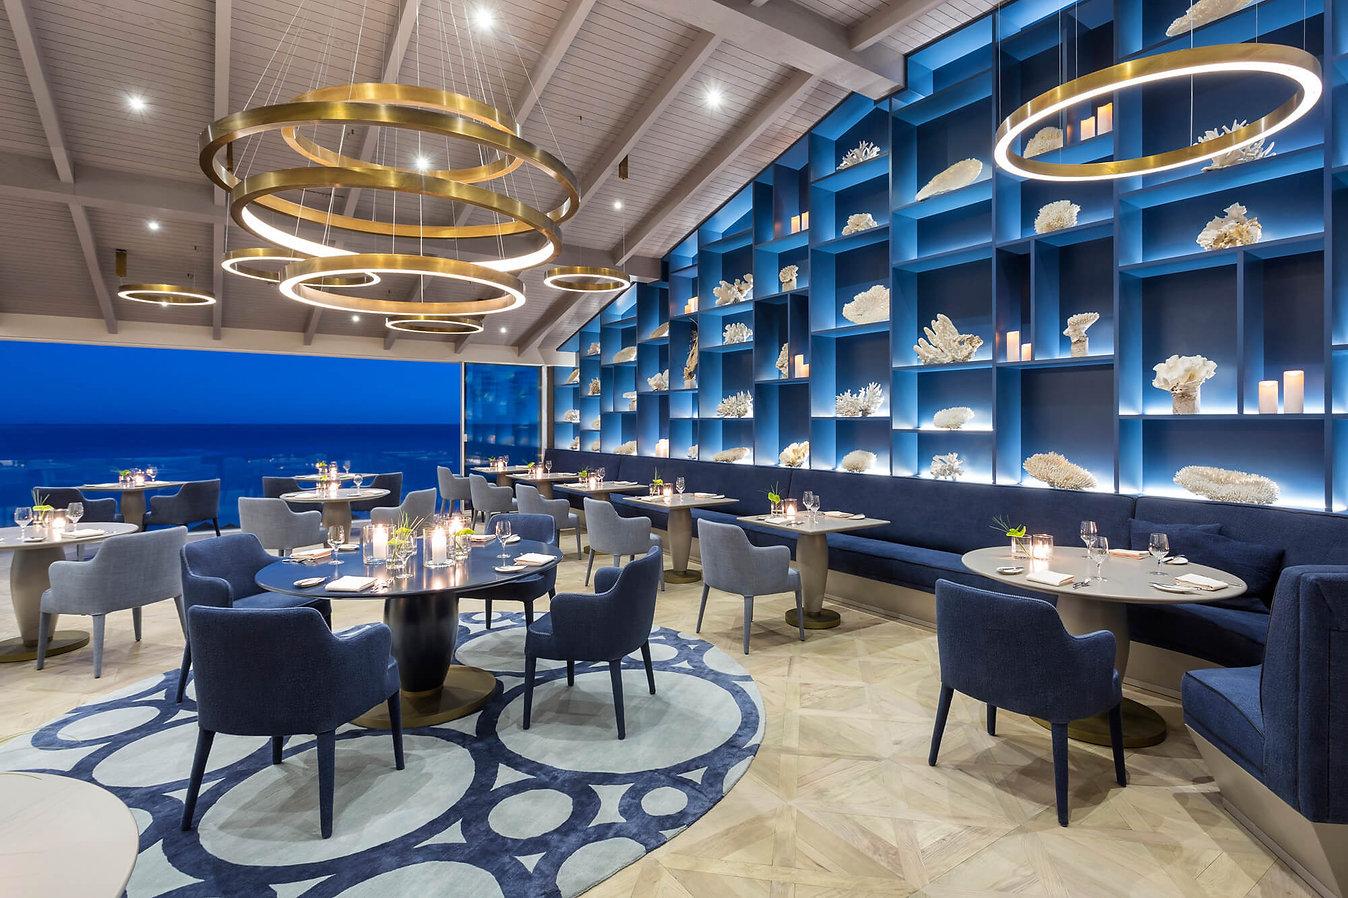 Ocean nuevo menú (Restaurantes) - GastroMadrid